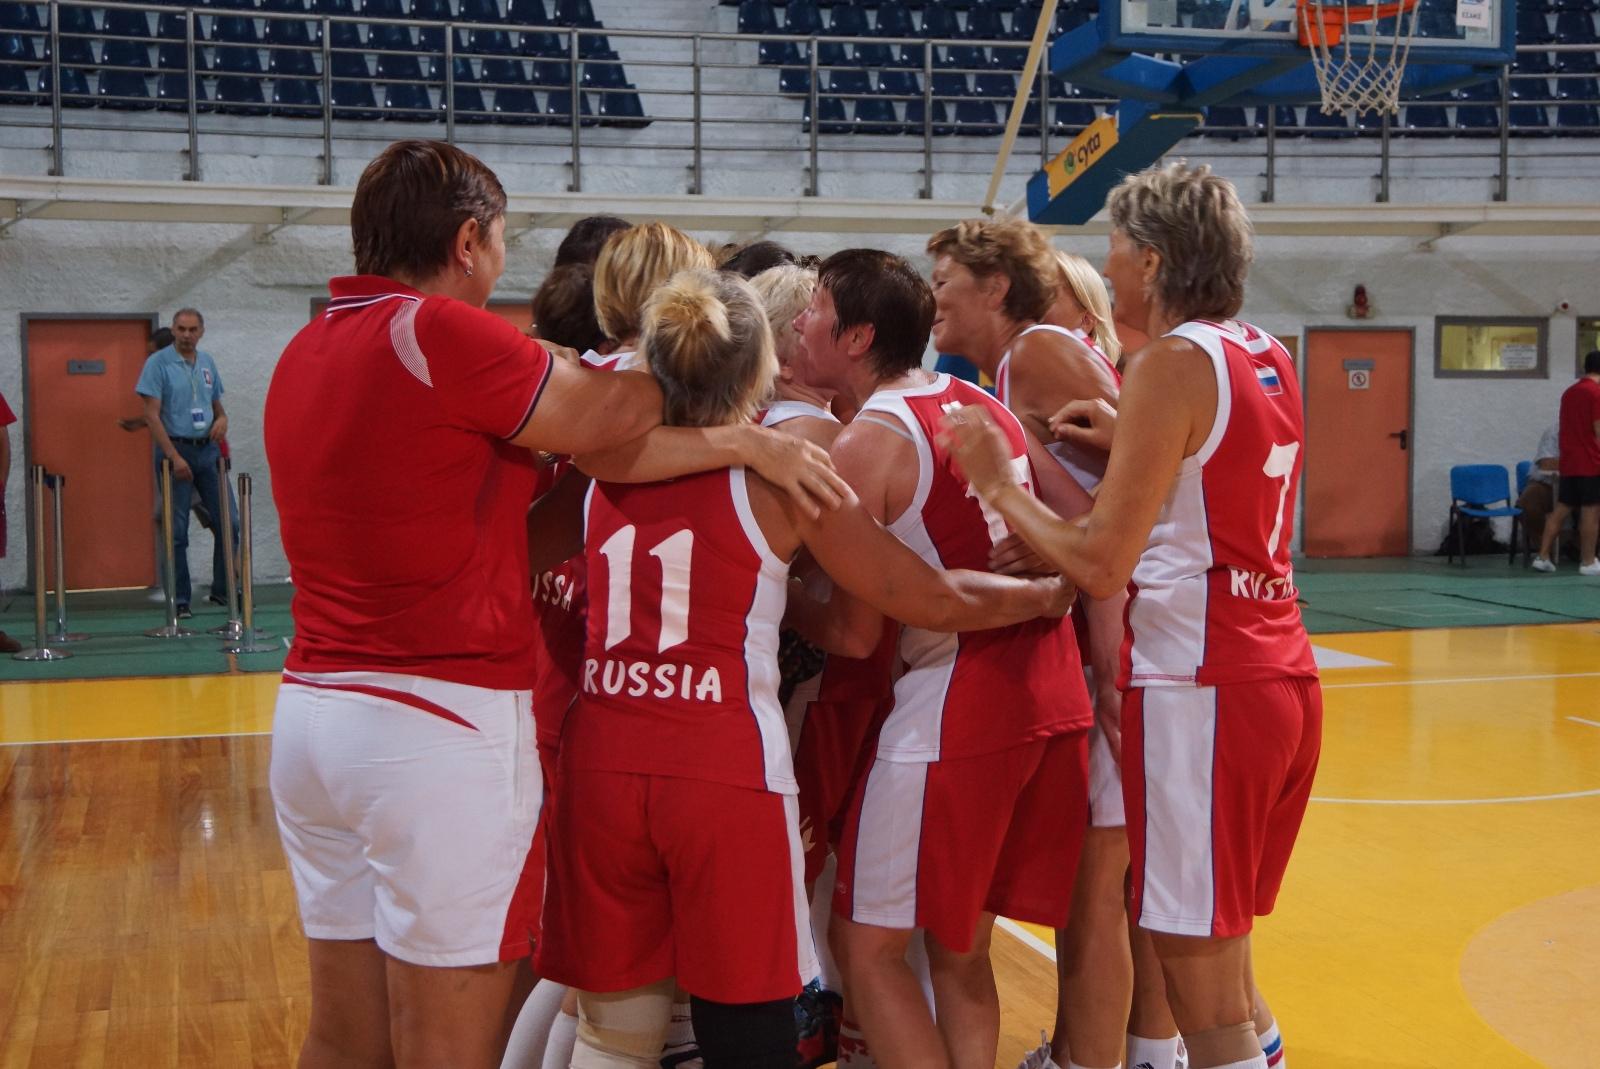 ALEXANDRION 1 | F50+ | POLSKA POLAND - MOSCOW RUSSIA A | Final